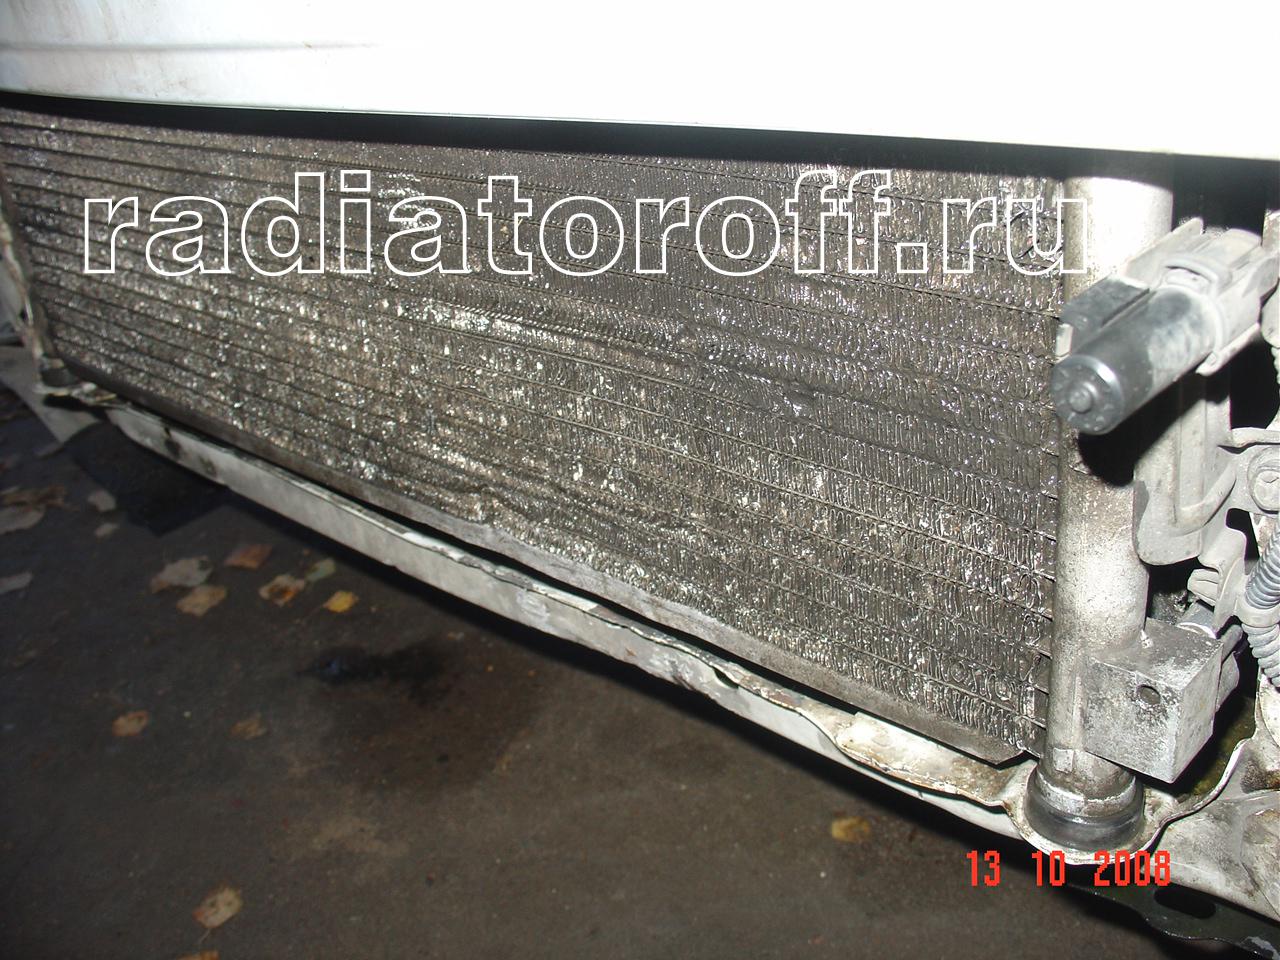 7 KINDERKUTJE PIXS.RU.PTHC Usage Statistics for www.radiatoroff.ru - Июнь 2014 - Ссылающаяся страница